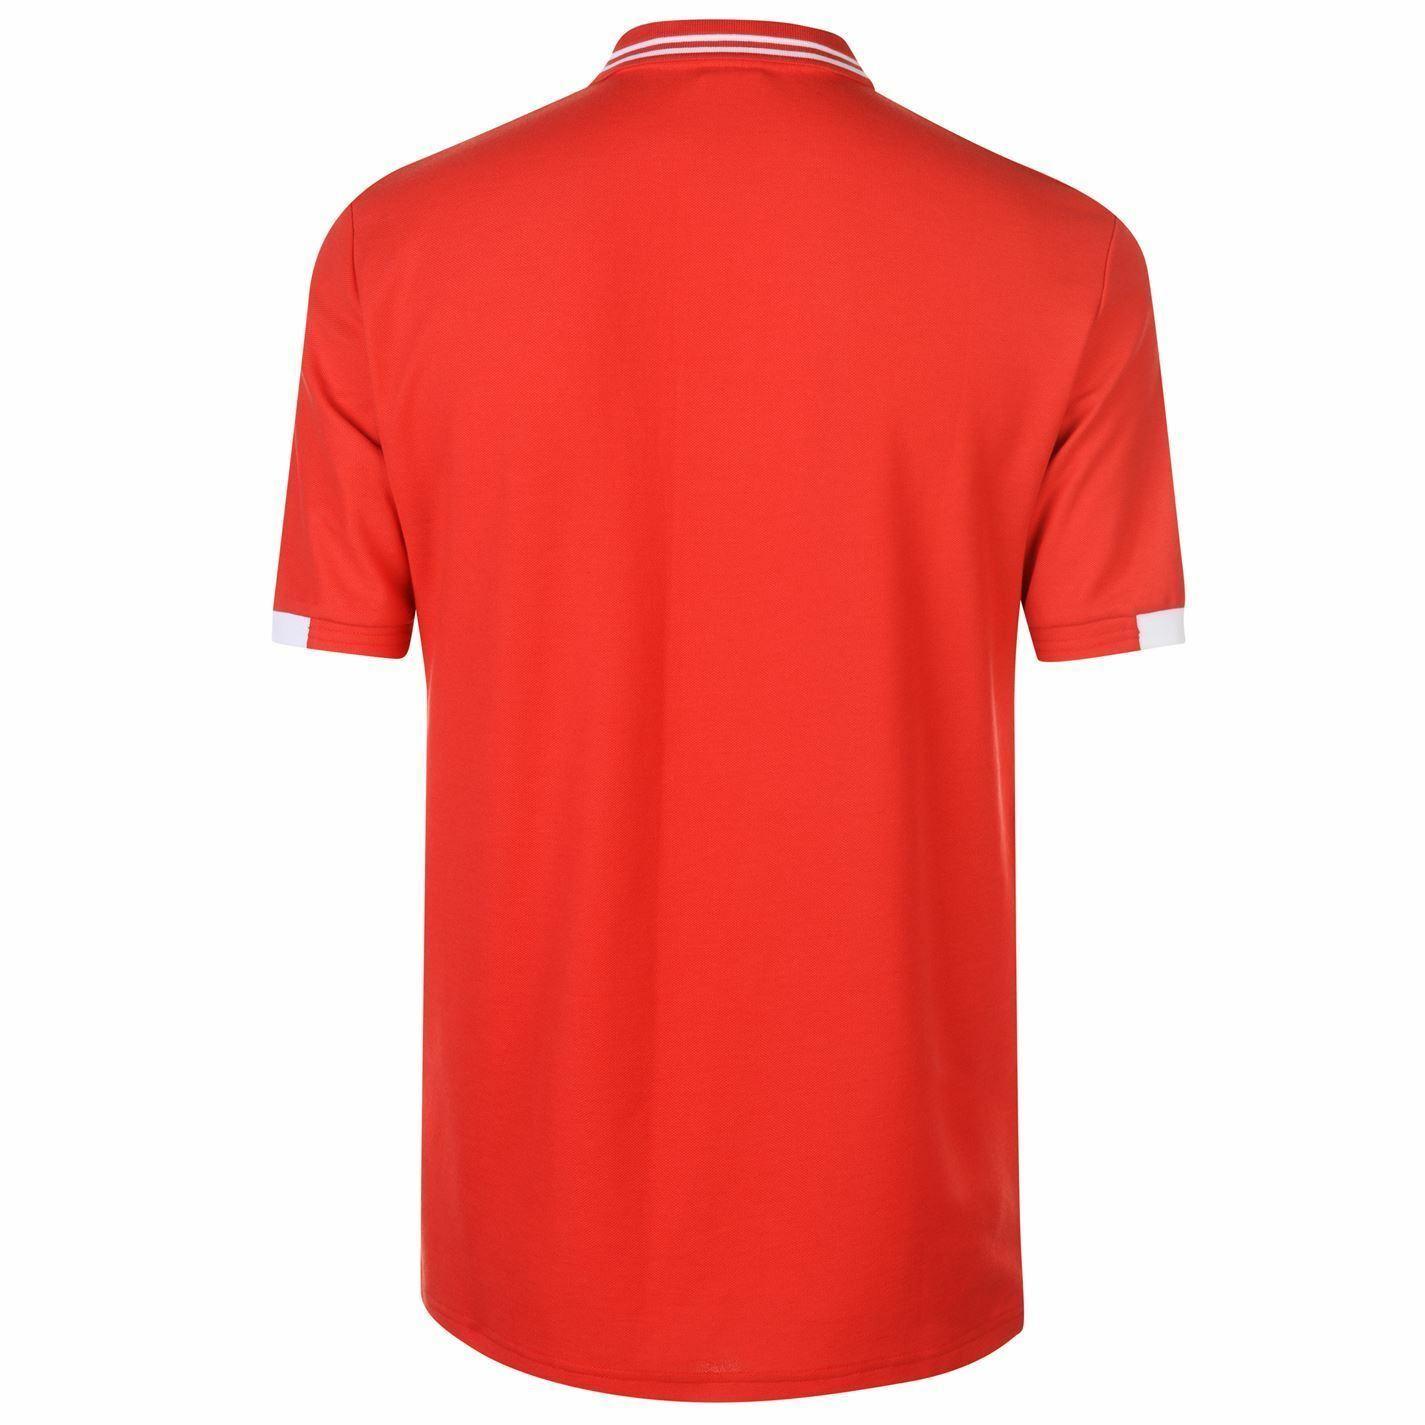 miniature 3 - FIFA Coupe du monde 2018 Angleterre Polo Shirt Homme Football Soccer Top T-Shirt Tee